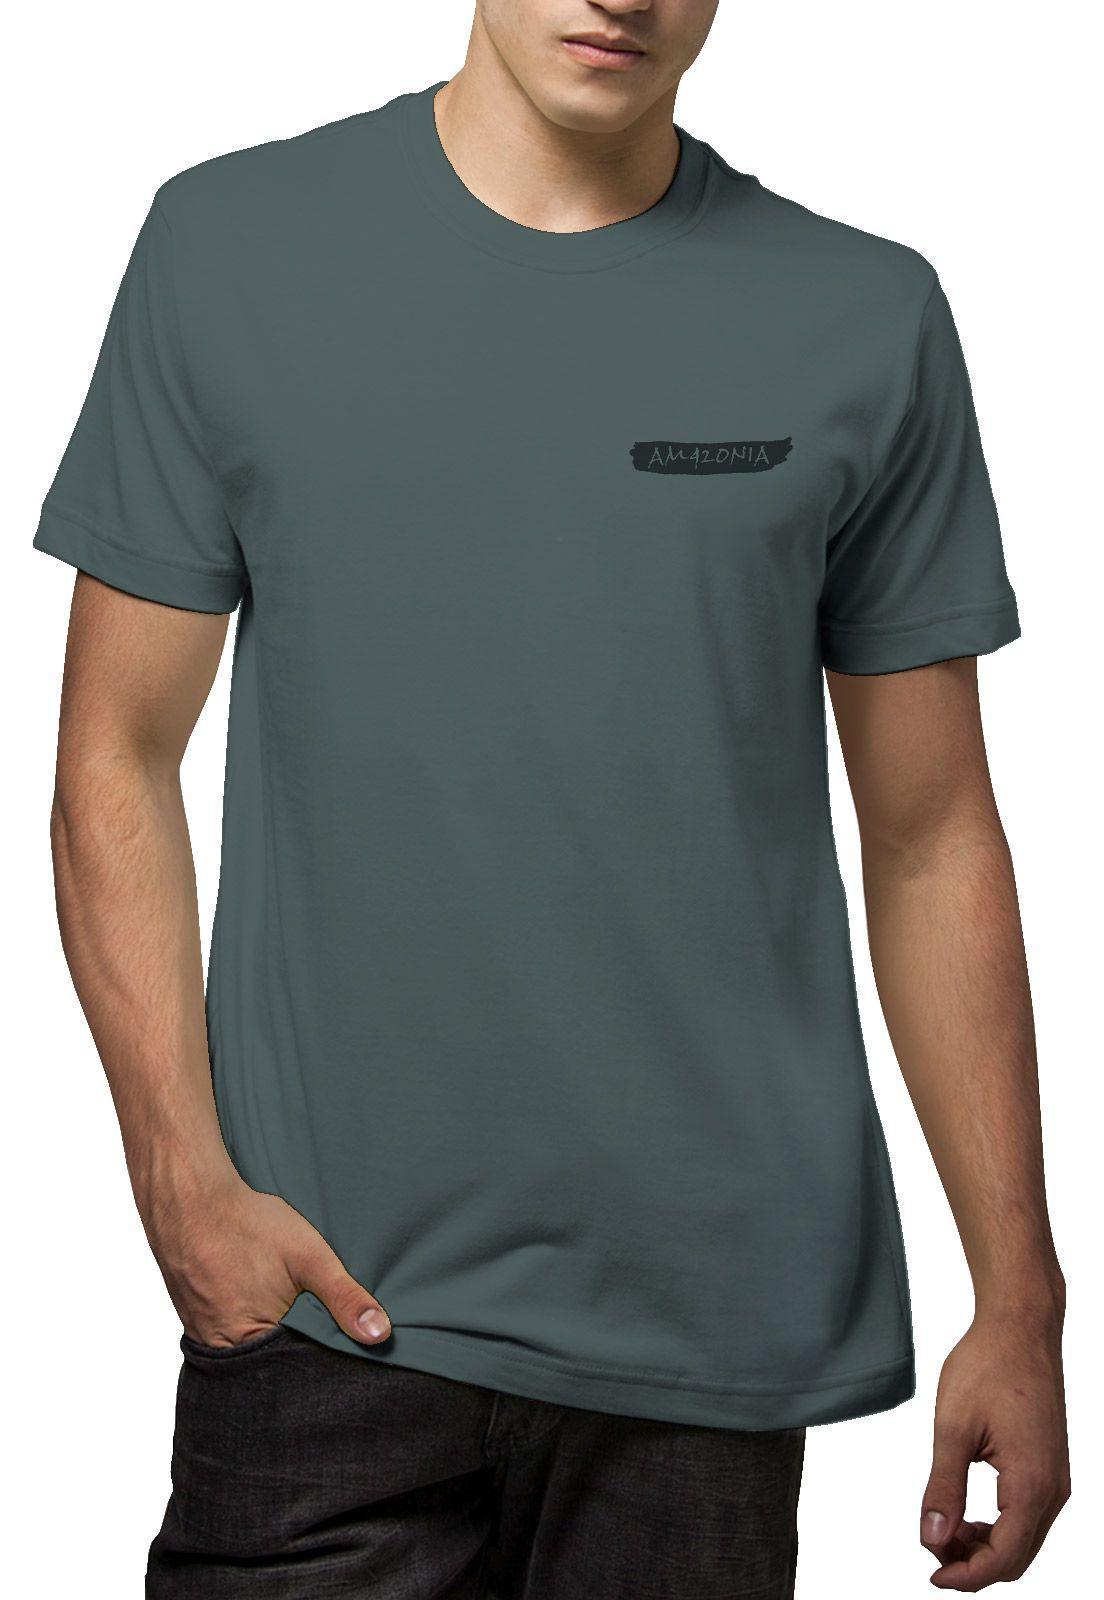 Camiseta Amazônia Quadro Desmatamento - Cinza